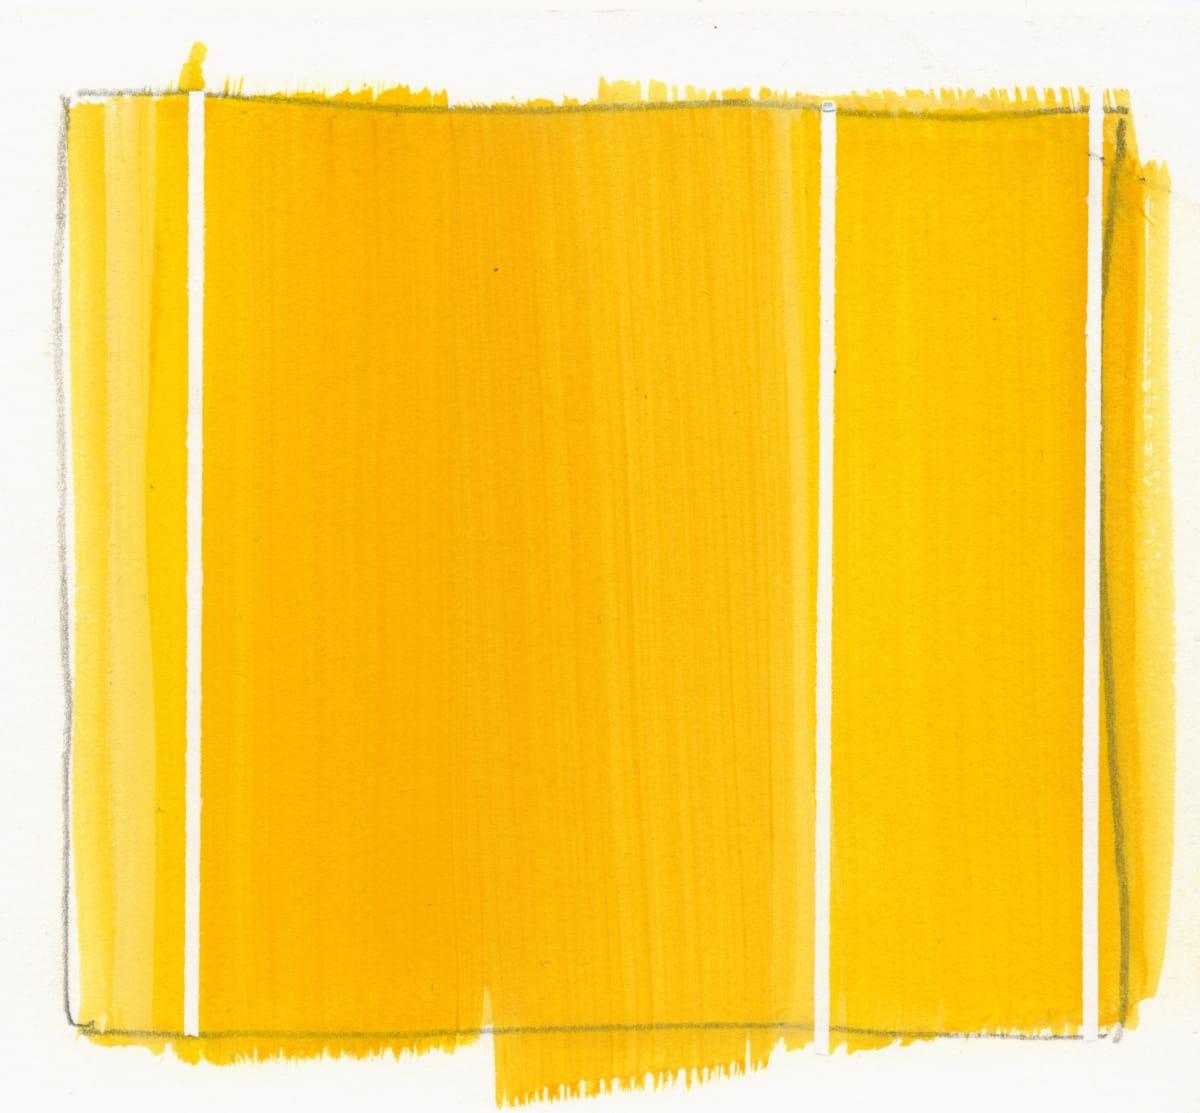 Matthew Langley, Kodak Yellow, 2018